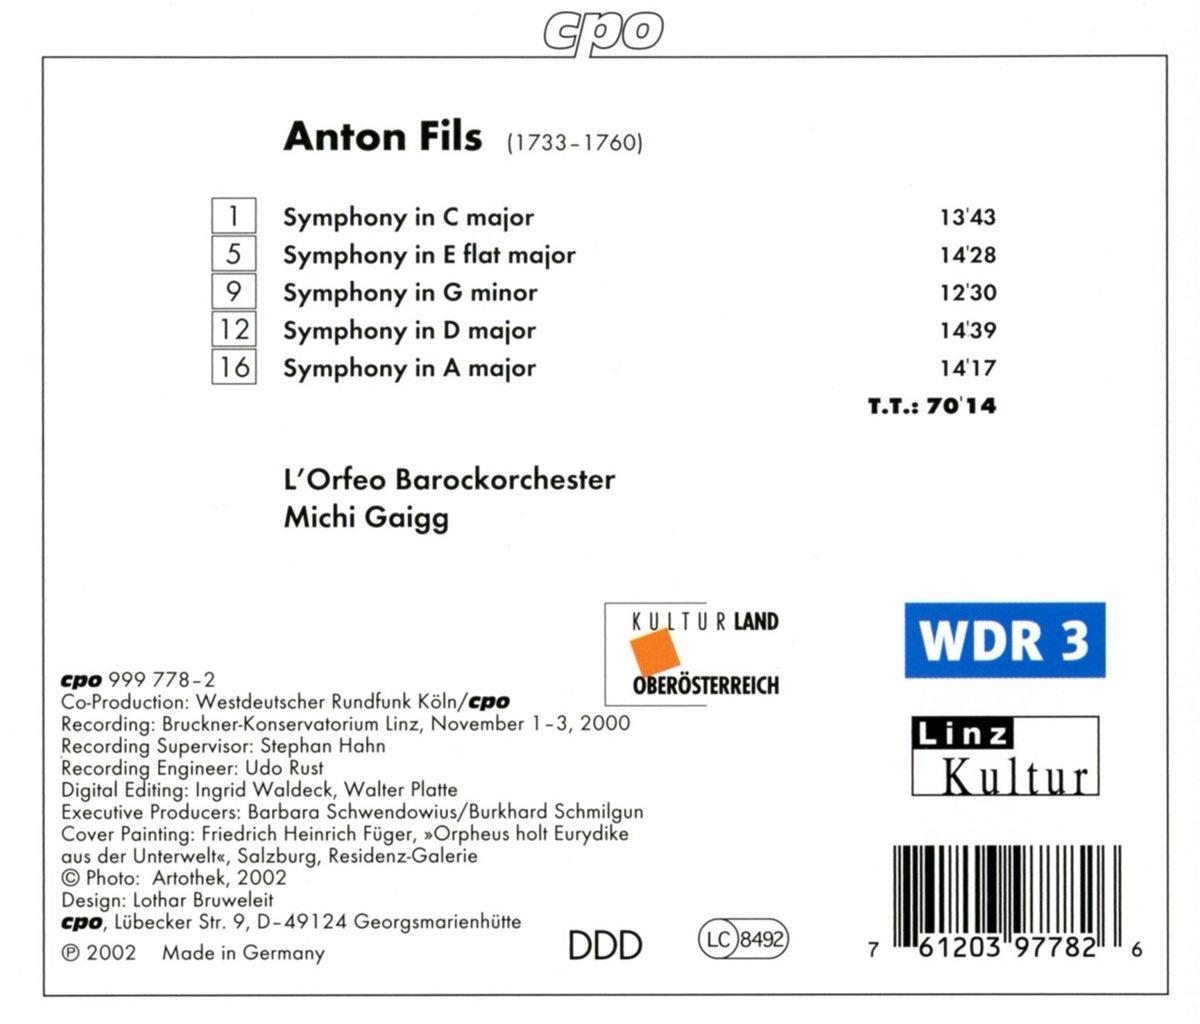 Anton Fils, Michi Gaigg, L'Orfeo Barockorchester - Fils ...